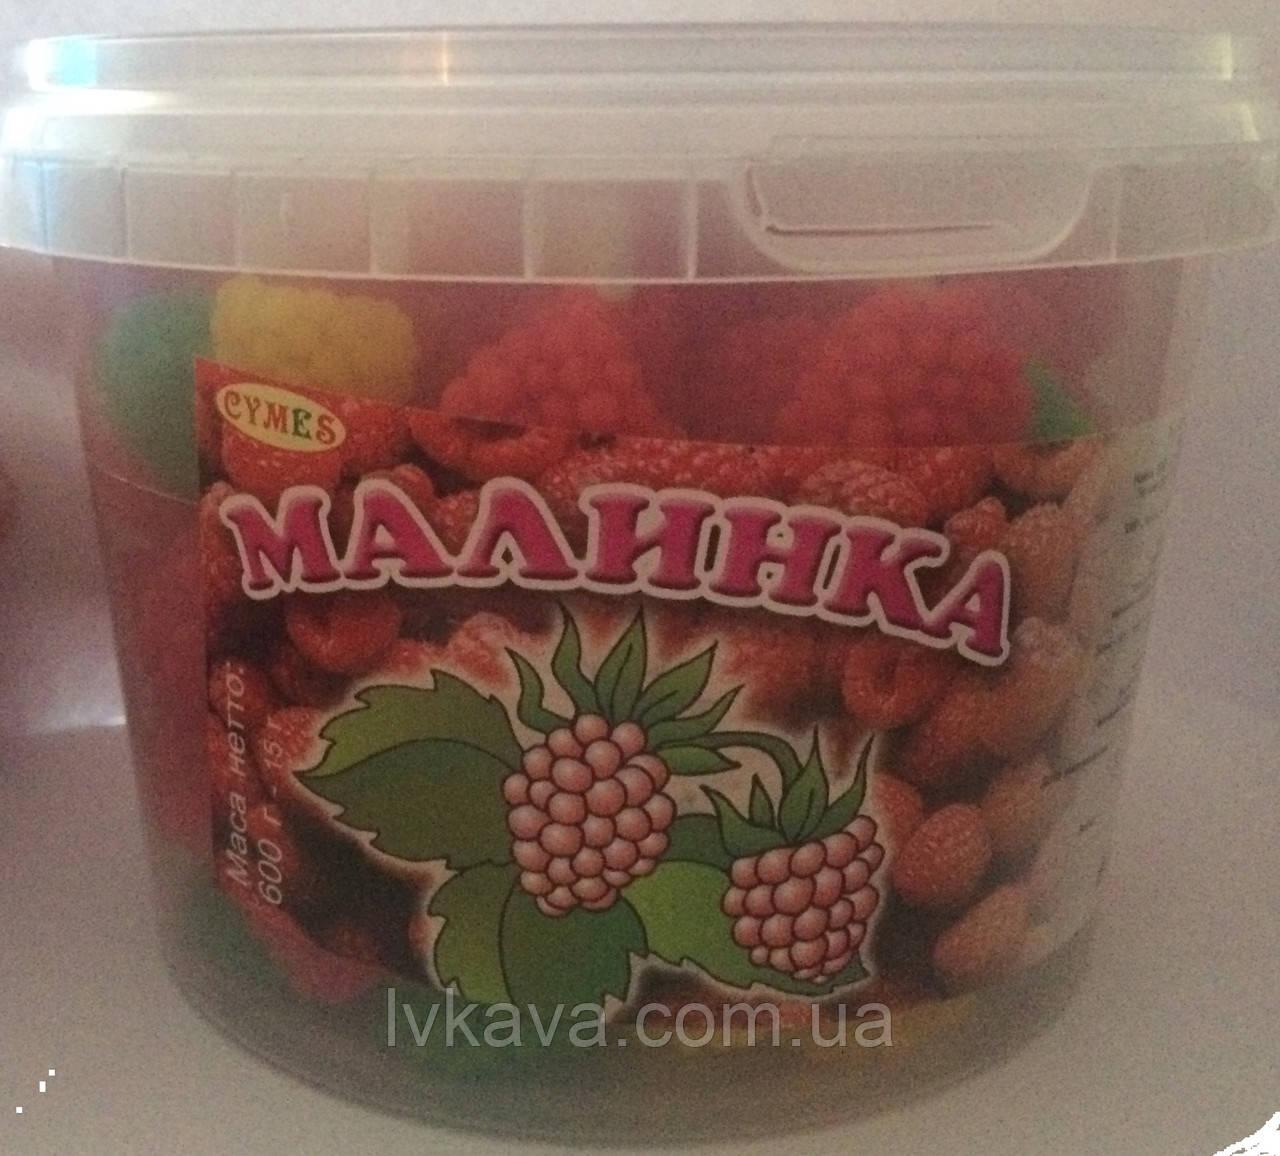 Жевательные конфеты Малинка Жувасики  , 450 гр